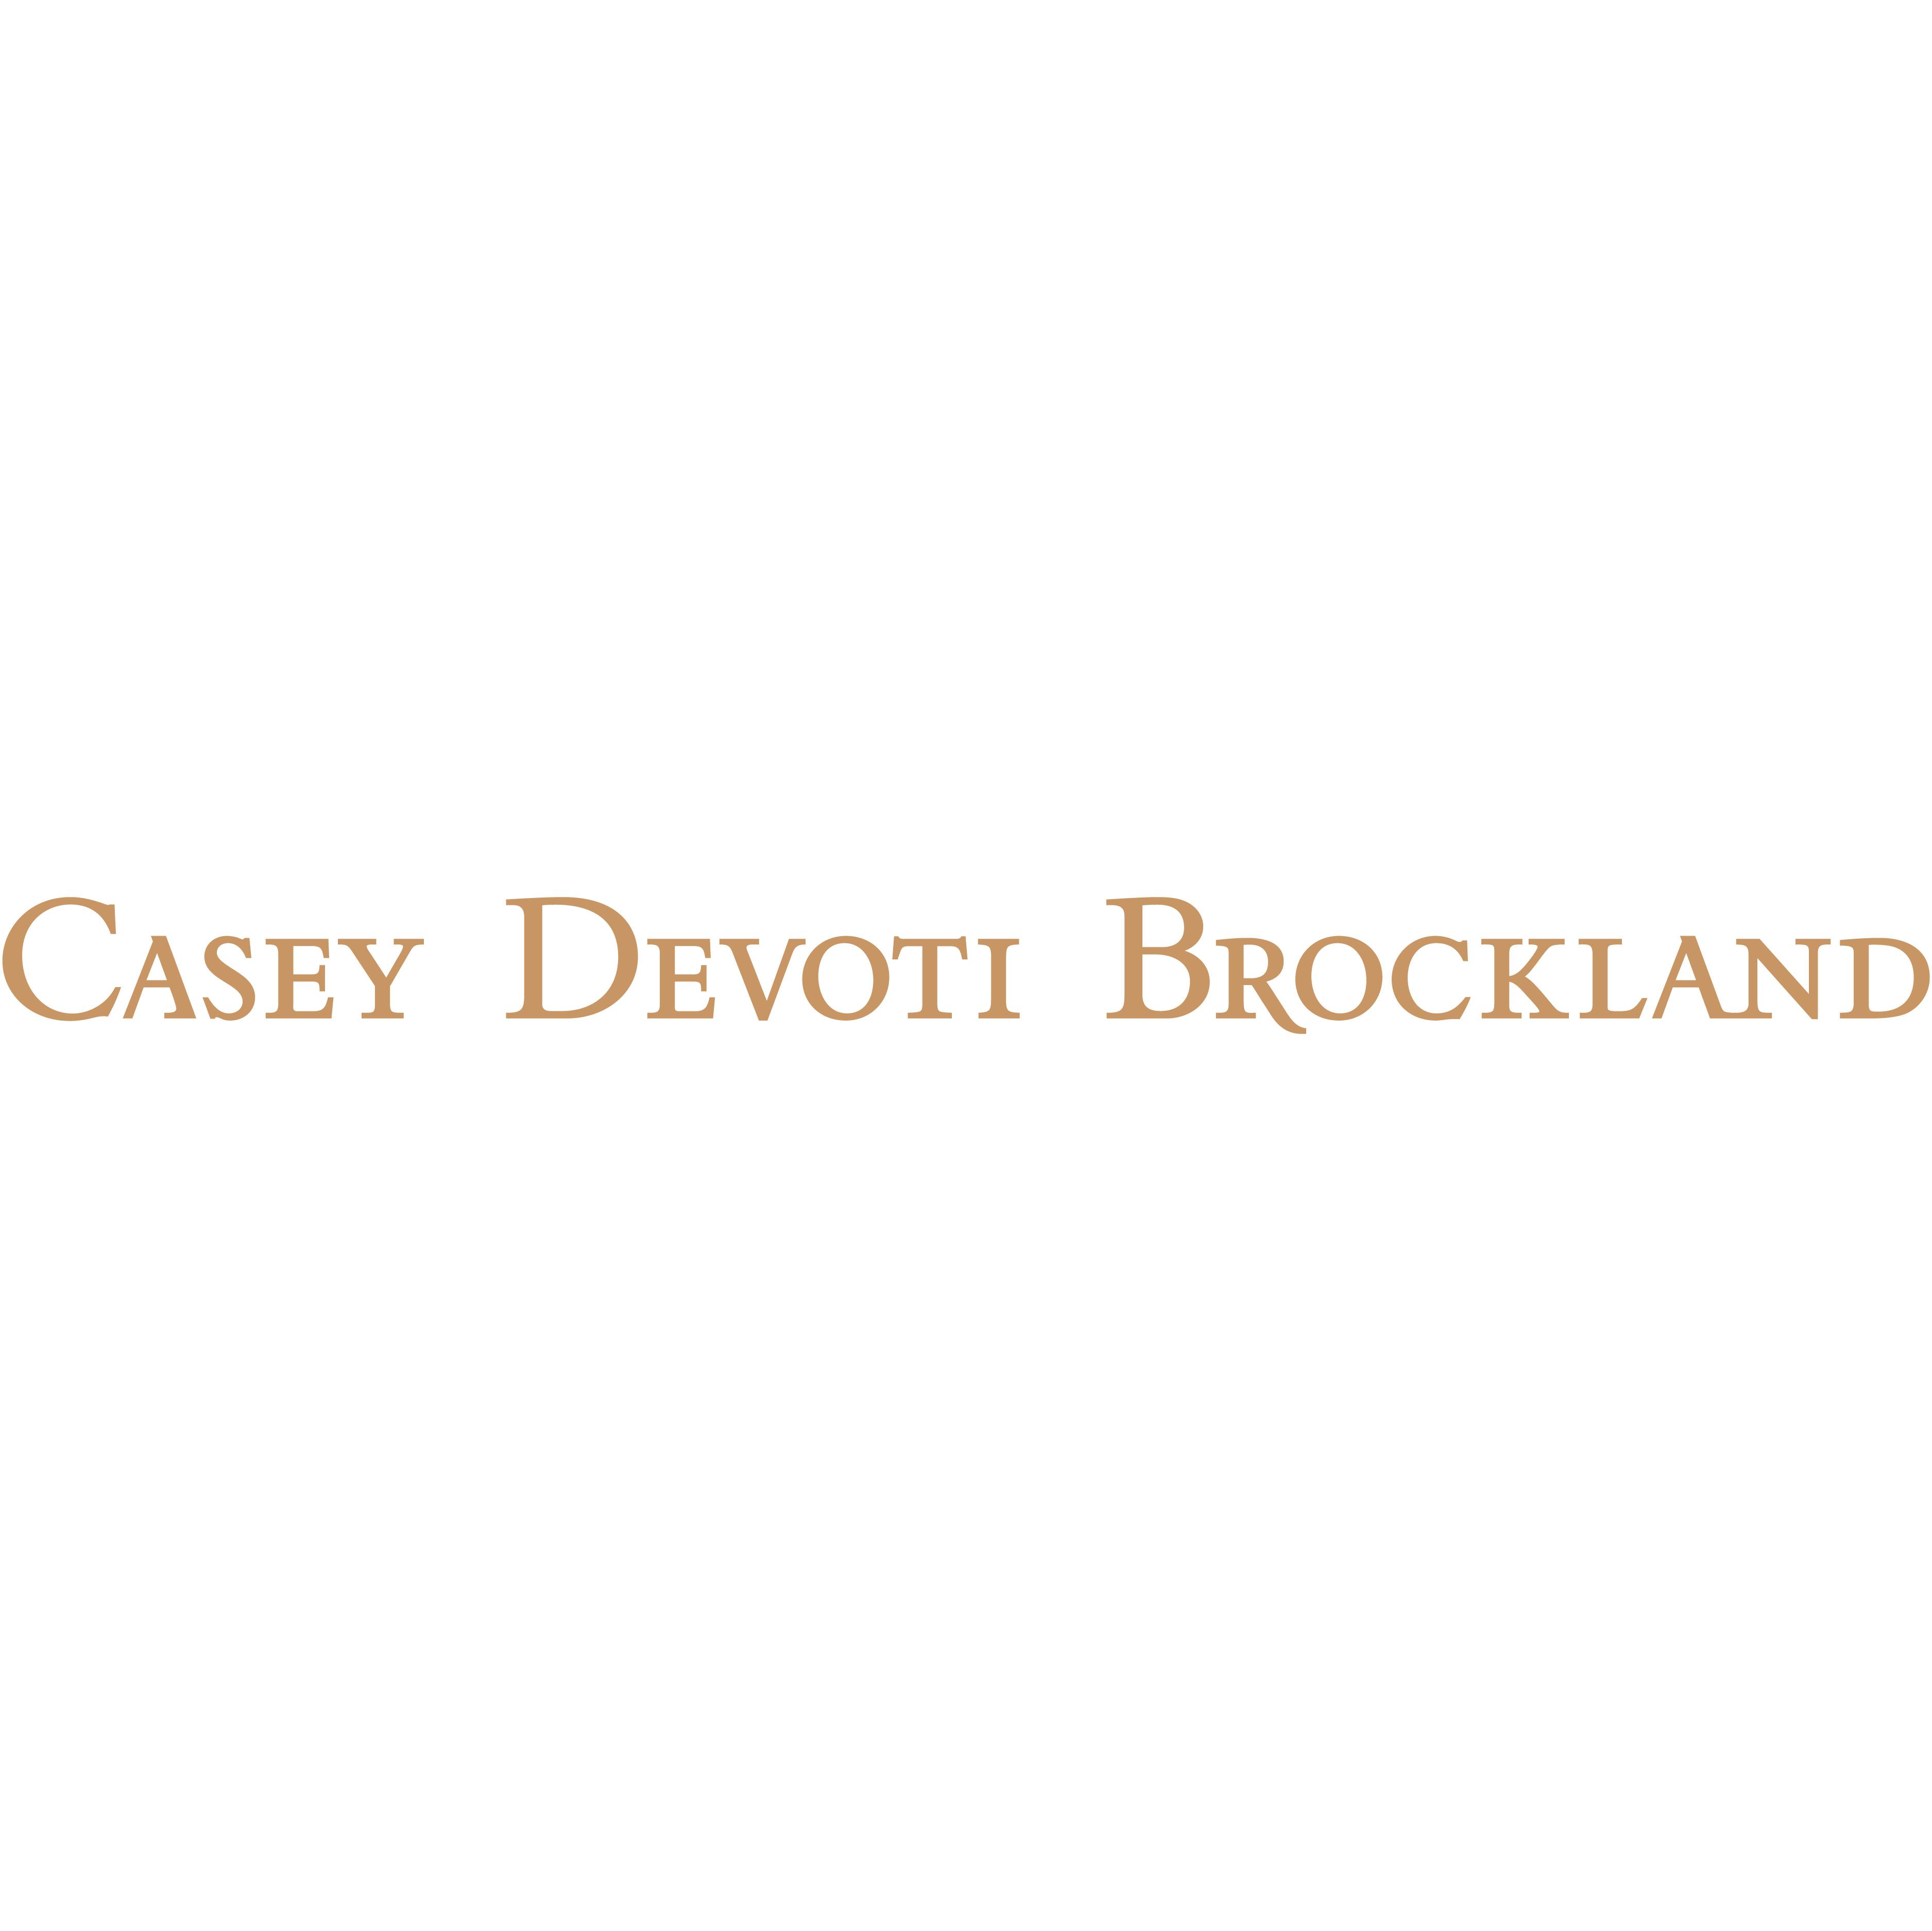 Casey Devoti & Brockland Logo 3